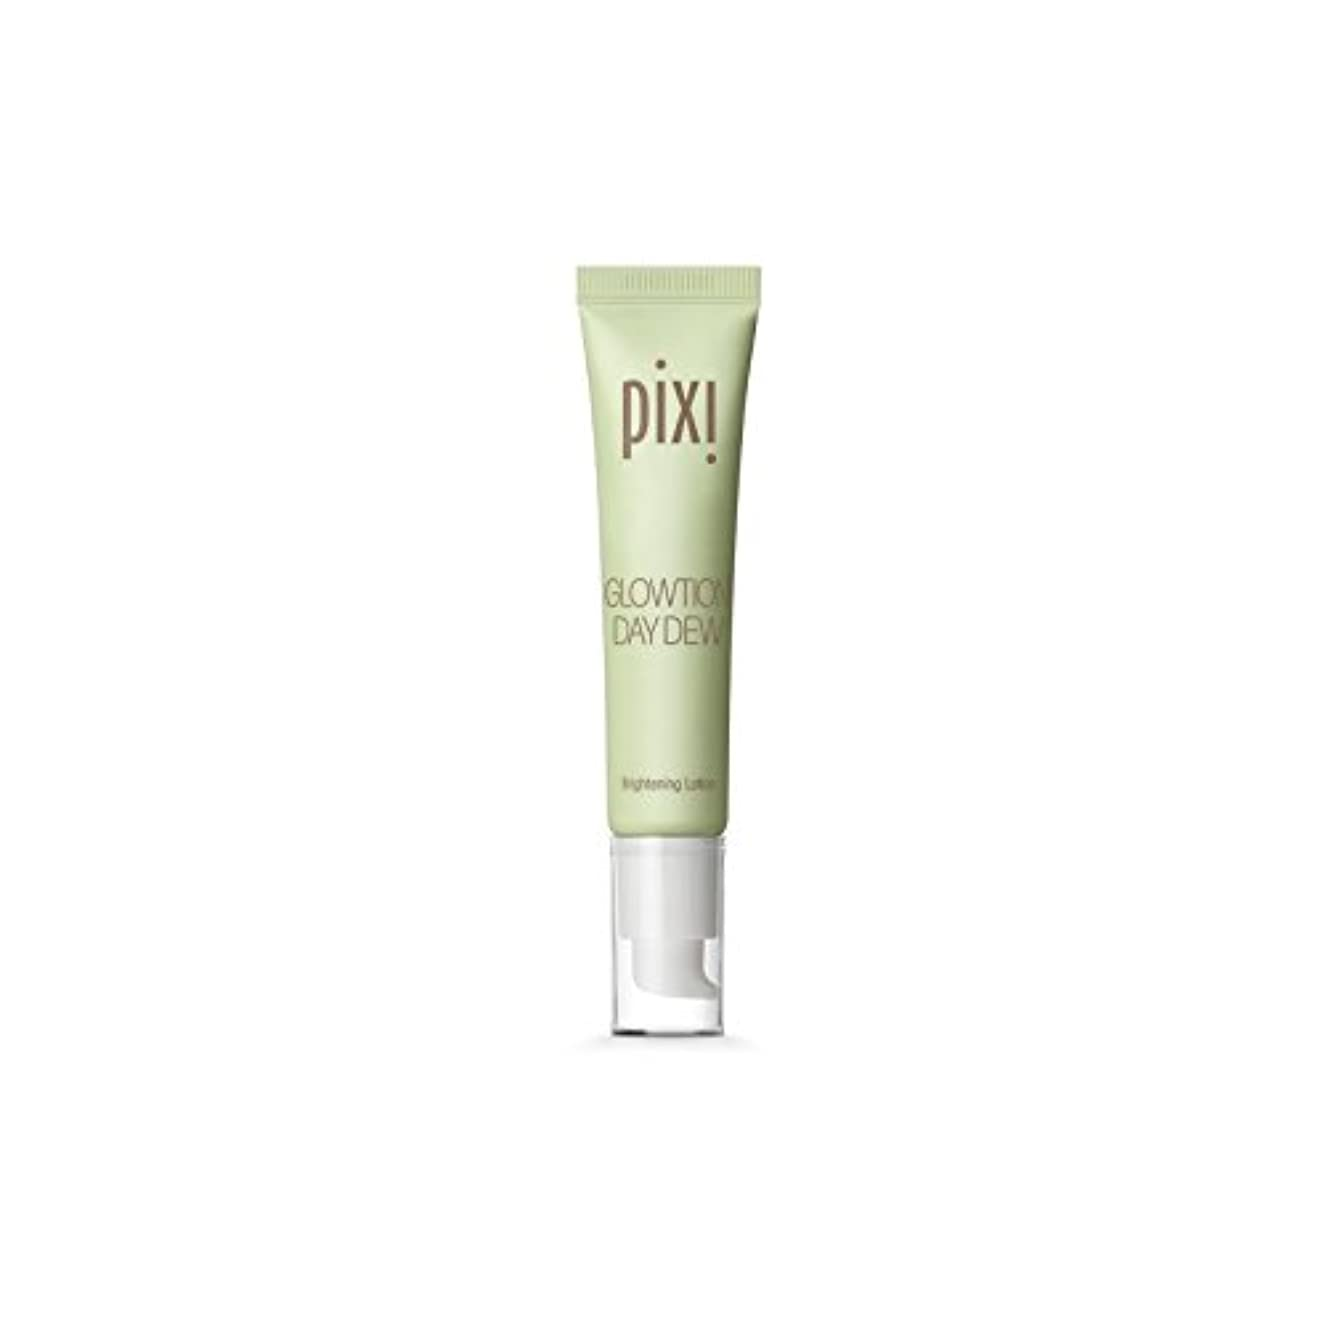 日露 x2 - Pixi Pixi Glowtion Day Dew (Pack of 2) [並行輸入品]